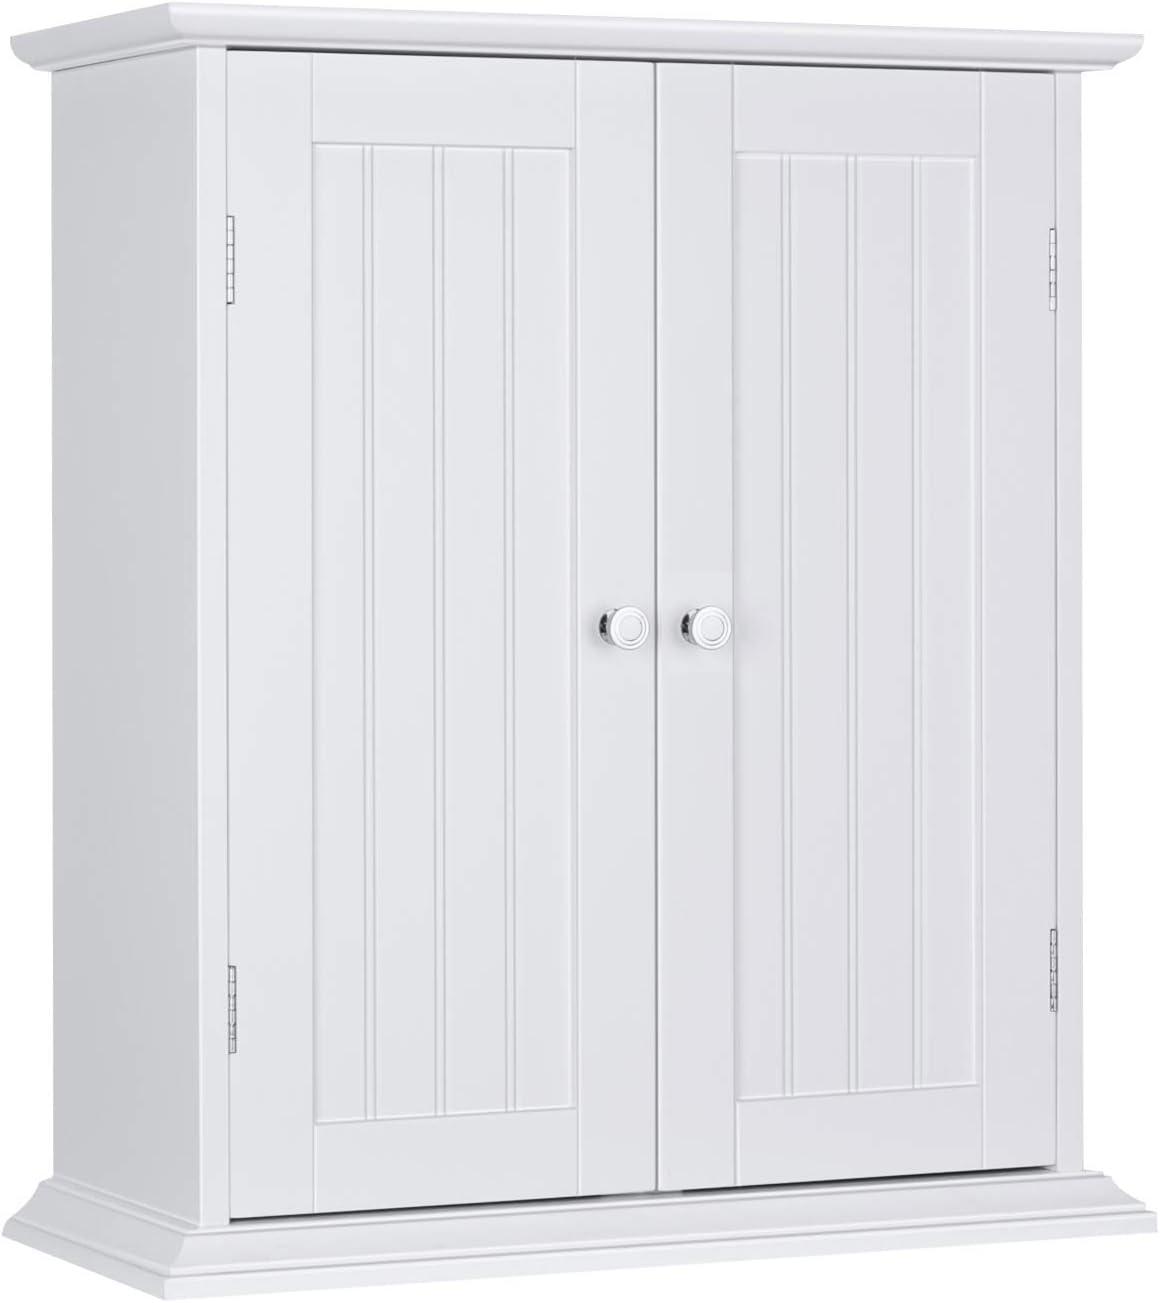 ChooChoo Bathroom Medicine Cabinet 2-Door Wall Cabinet Wood Hanging Cabinet with Adjustable Shelves White